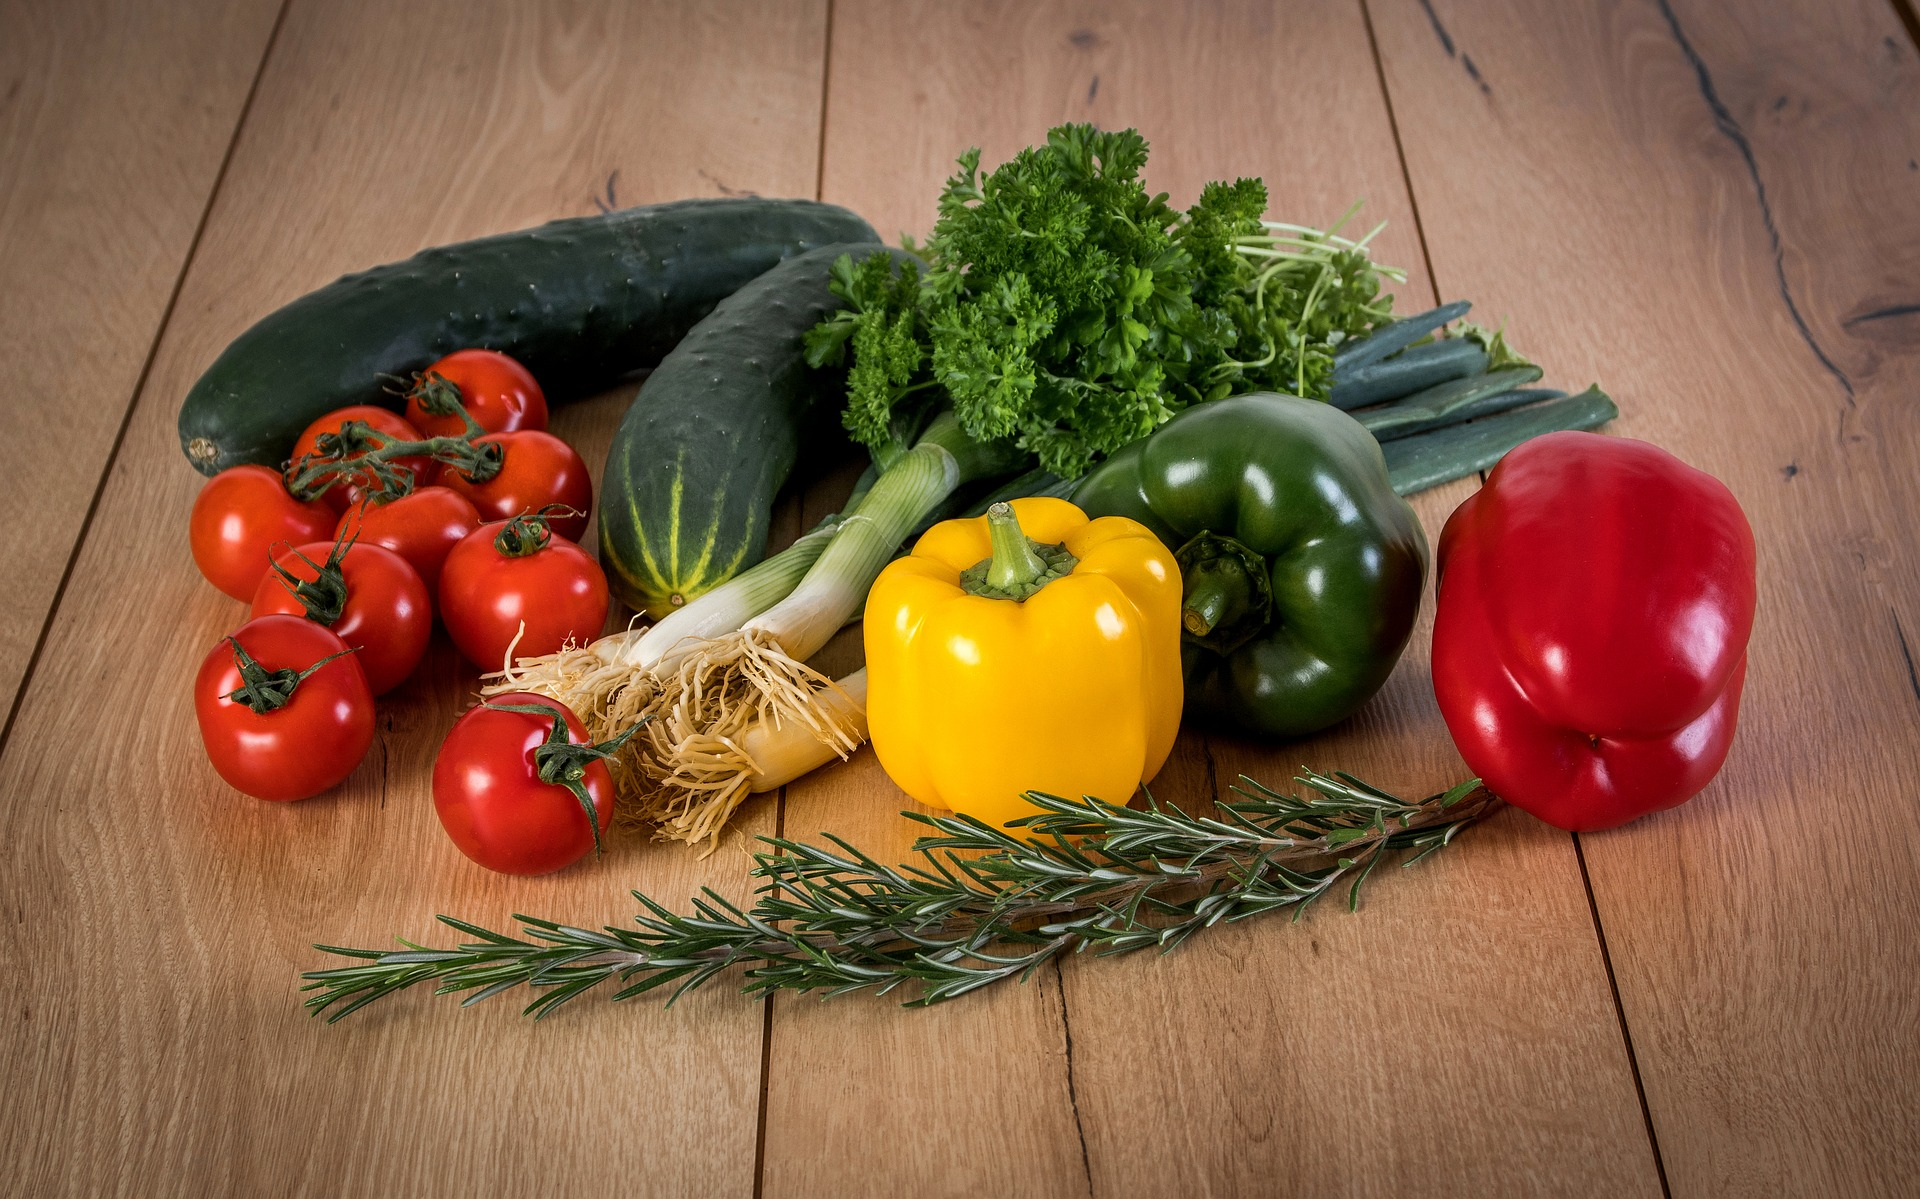 vegetables-2977891_1920.jpg